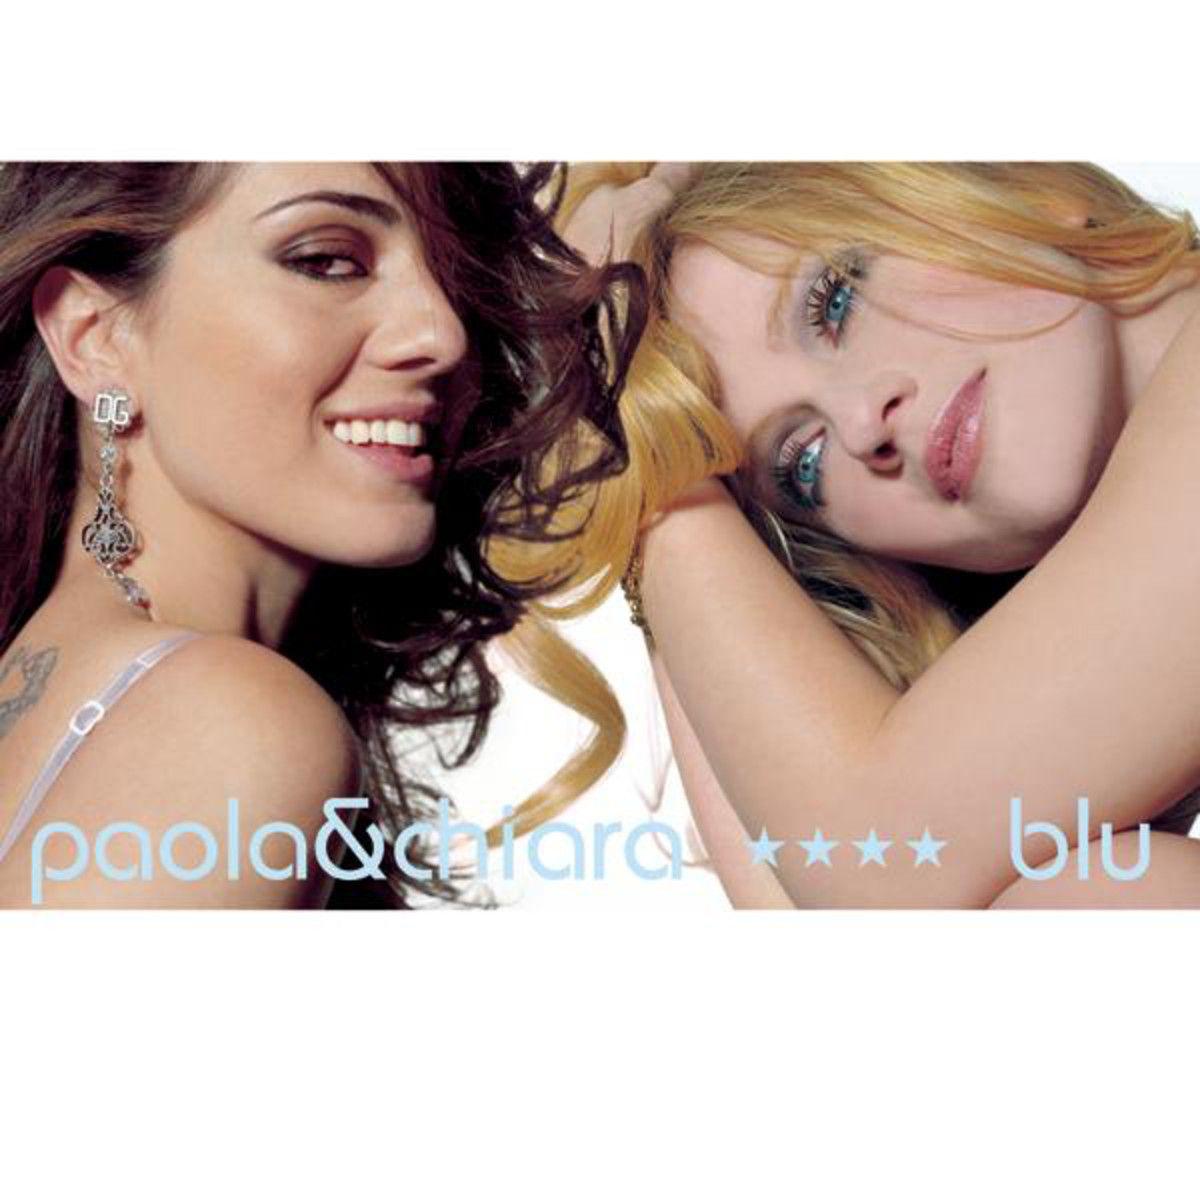 Paola & Chiara - Blu album cover